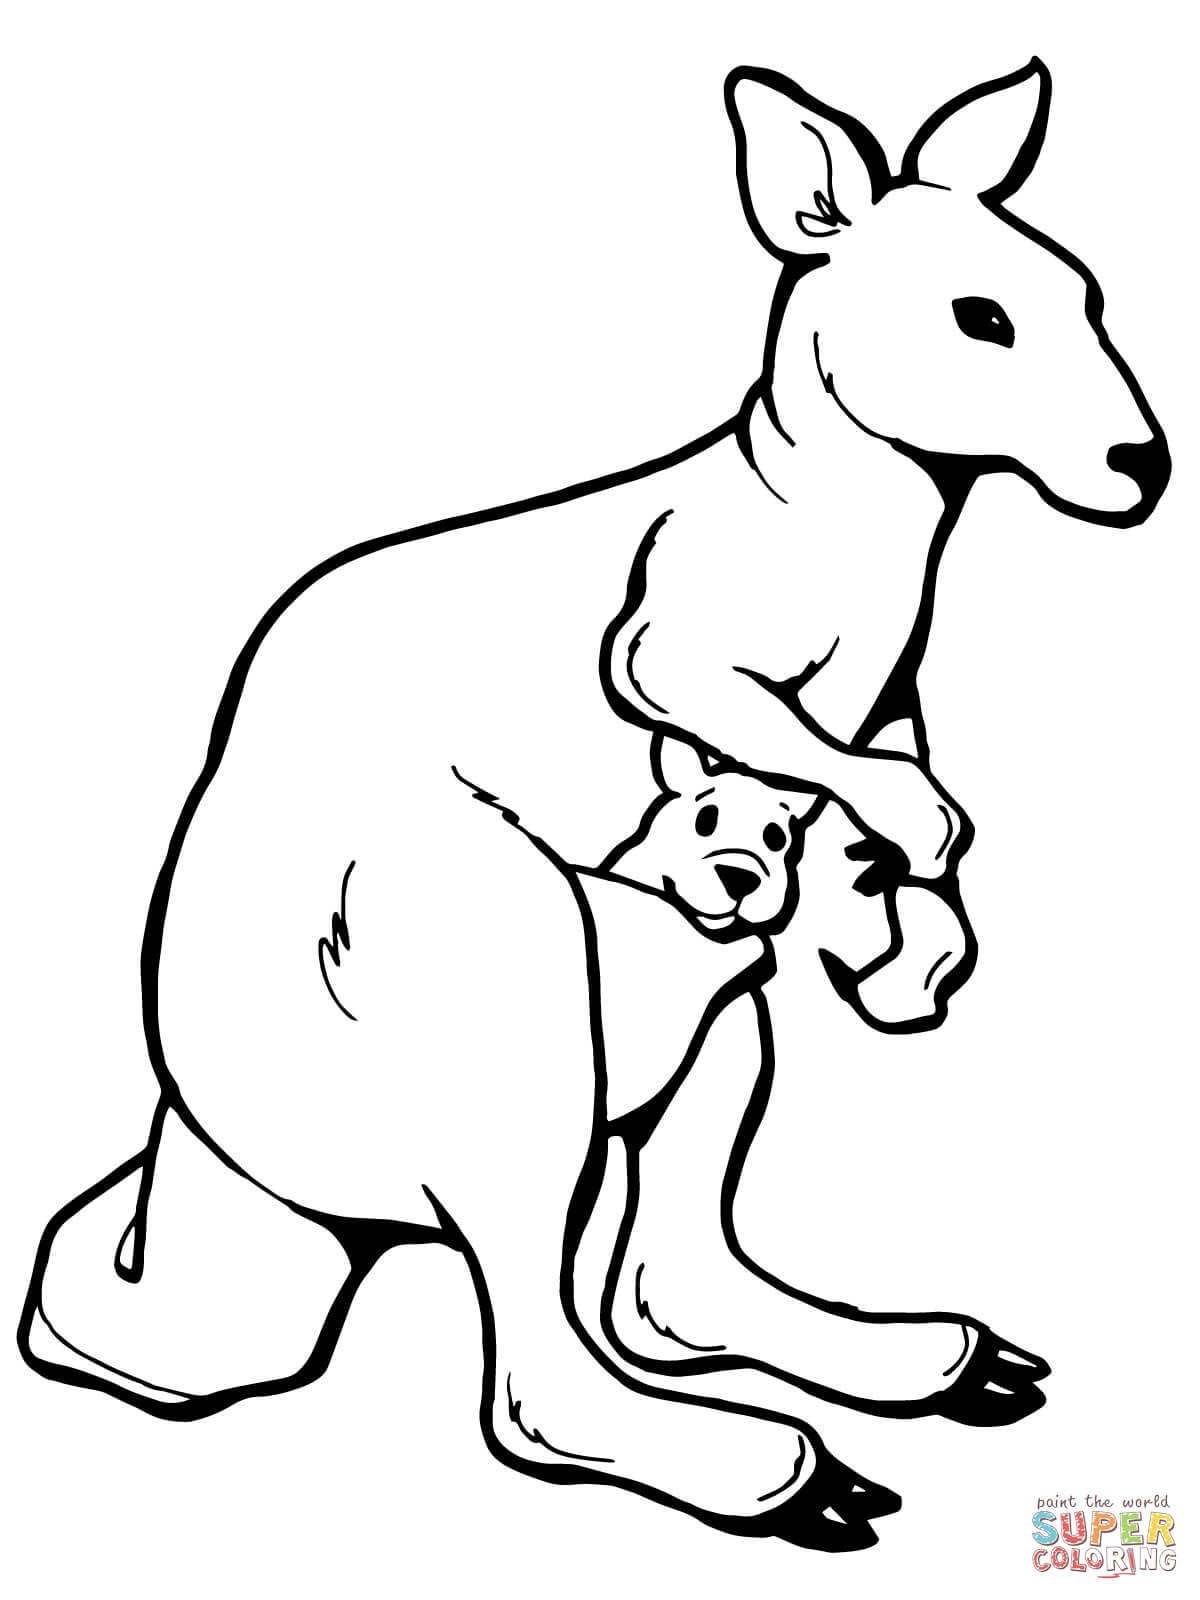 1200x1600 Kangaroo Coloring Page Preschool To Funny Draw Kids